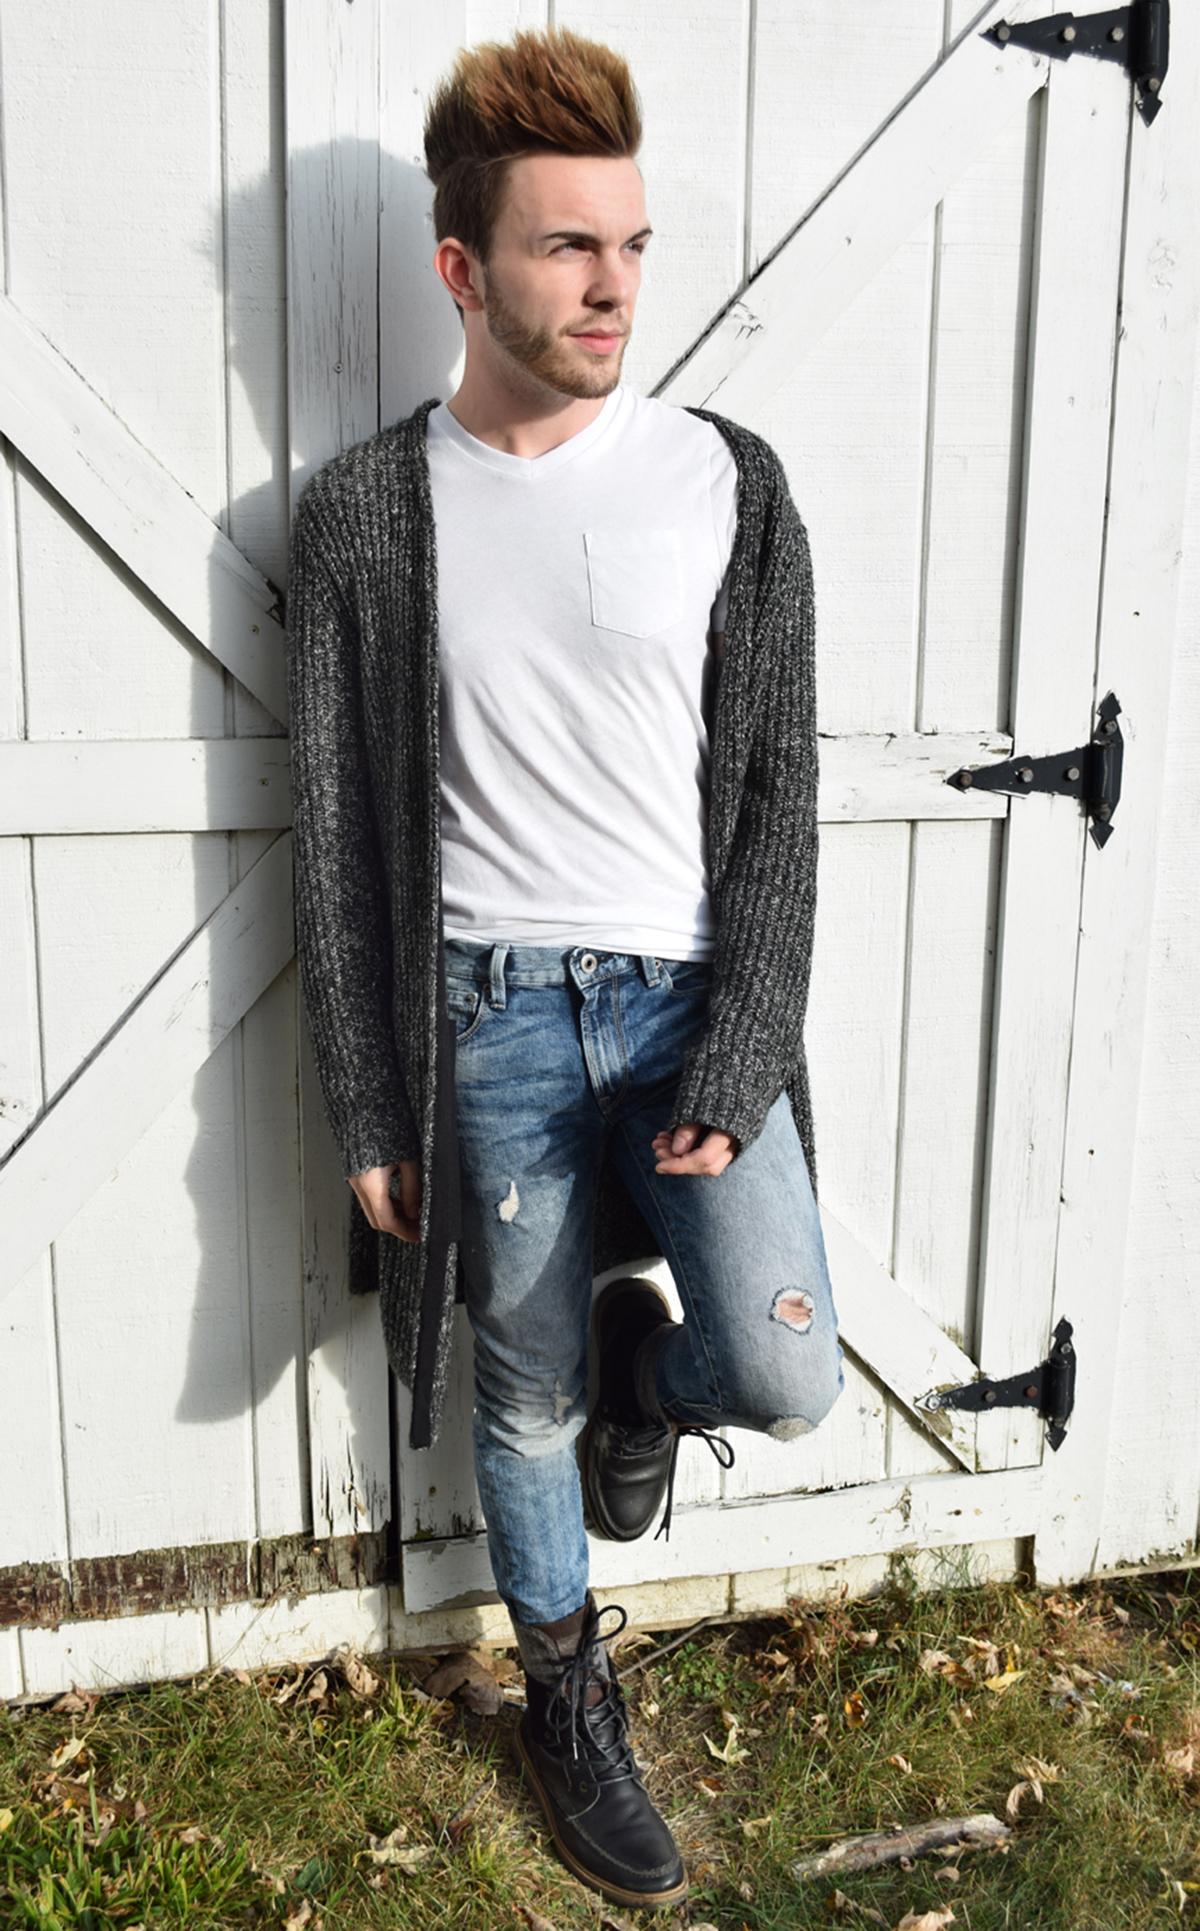 Duck boots men fashion - photo#21